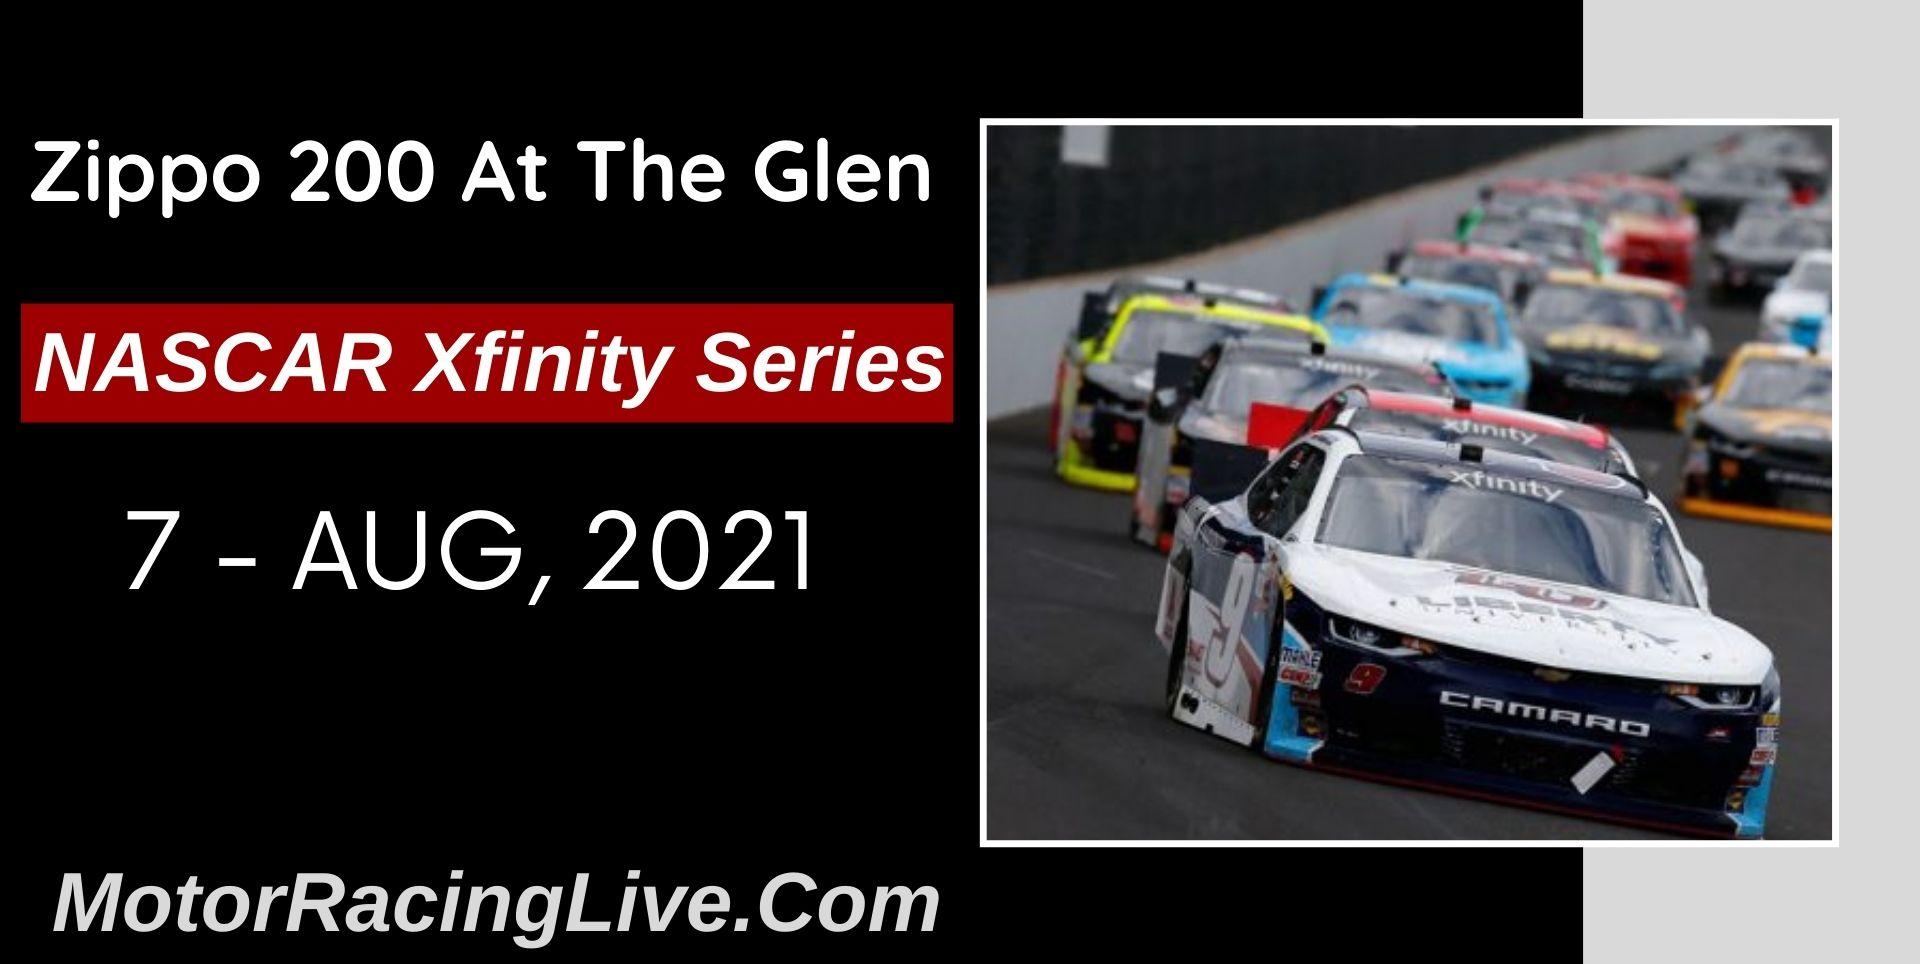 Zippo 200 At The Glen Live Stream 2021: NASCAR Xfinity